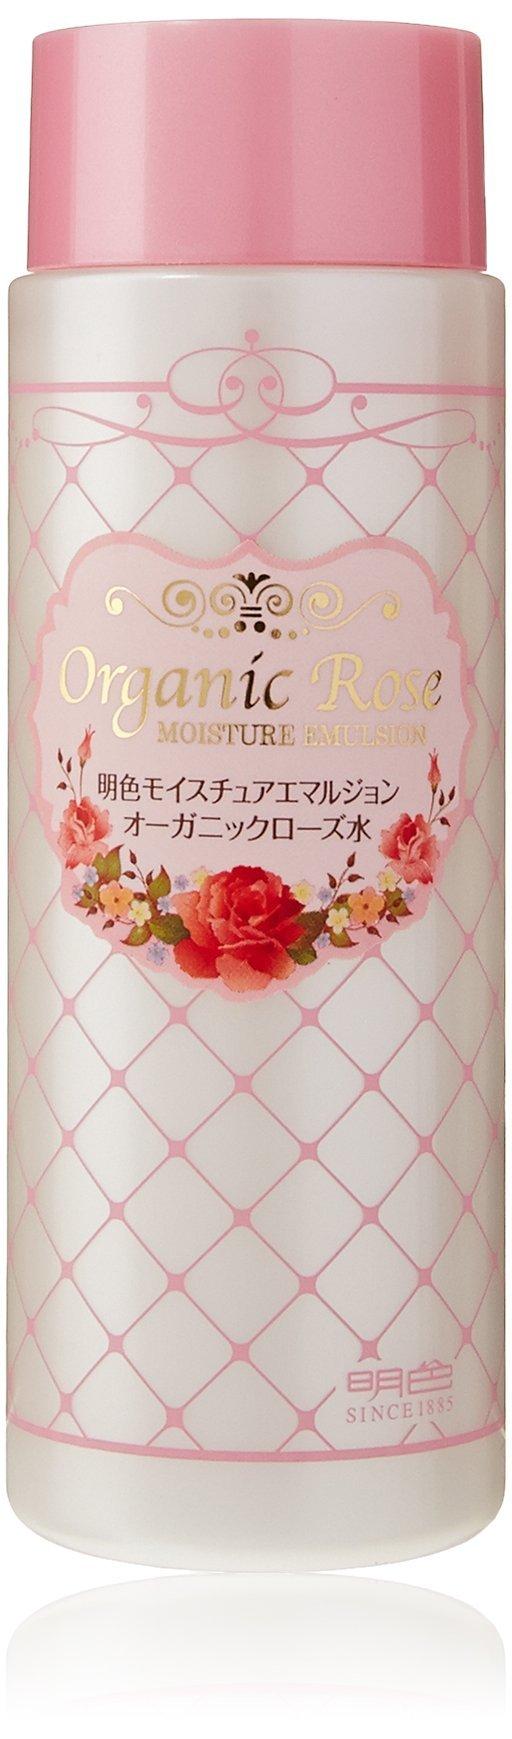 ORGANIC ROSE Meishoku Moisture Emulsion, 6 Fluid Ounce